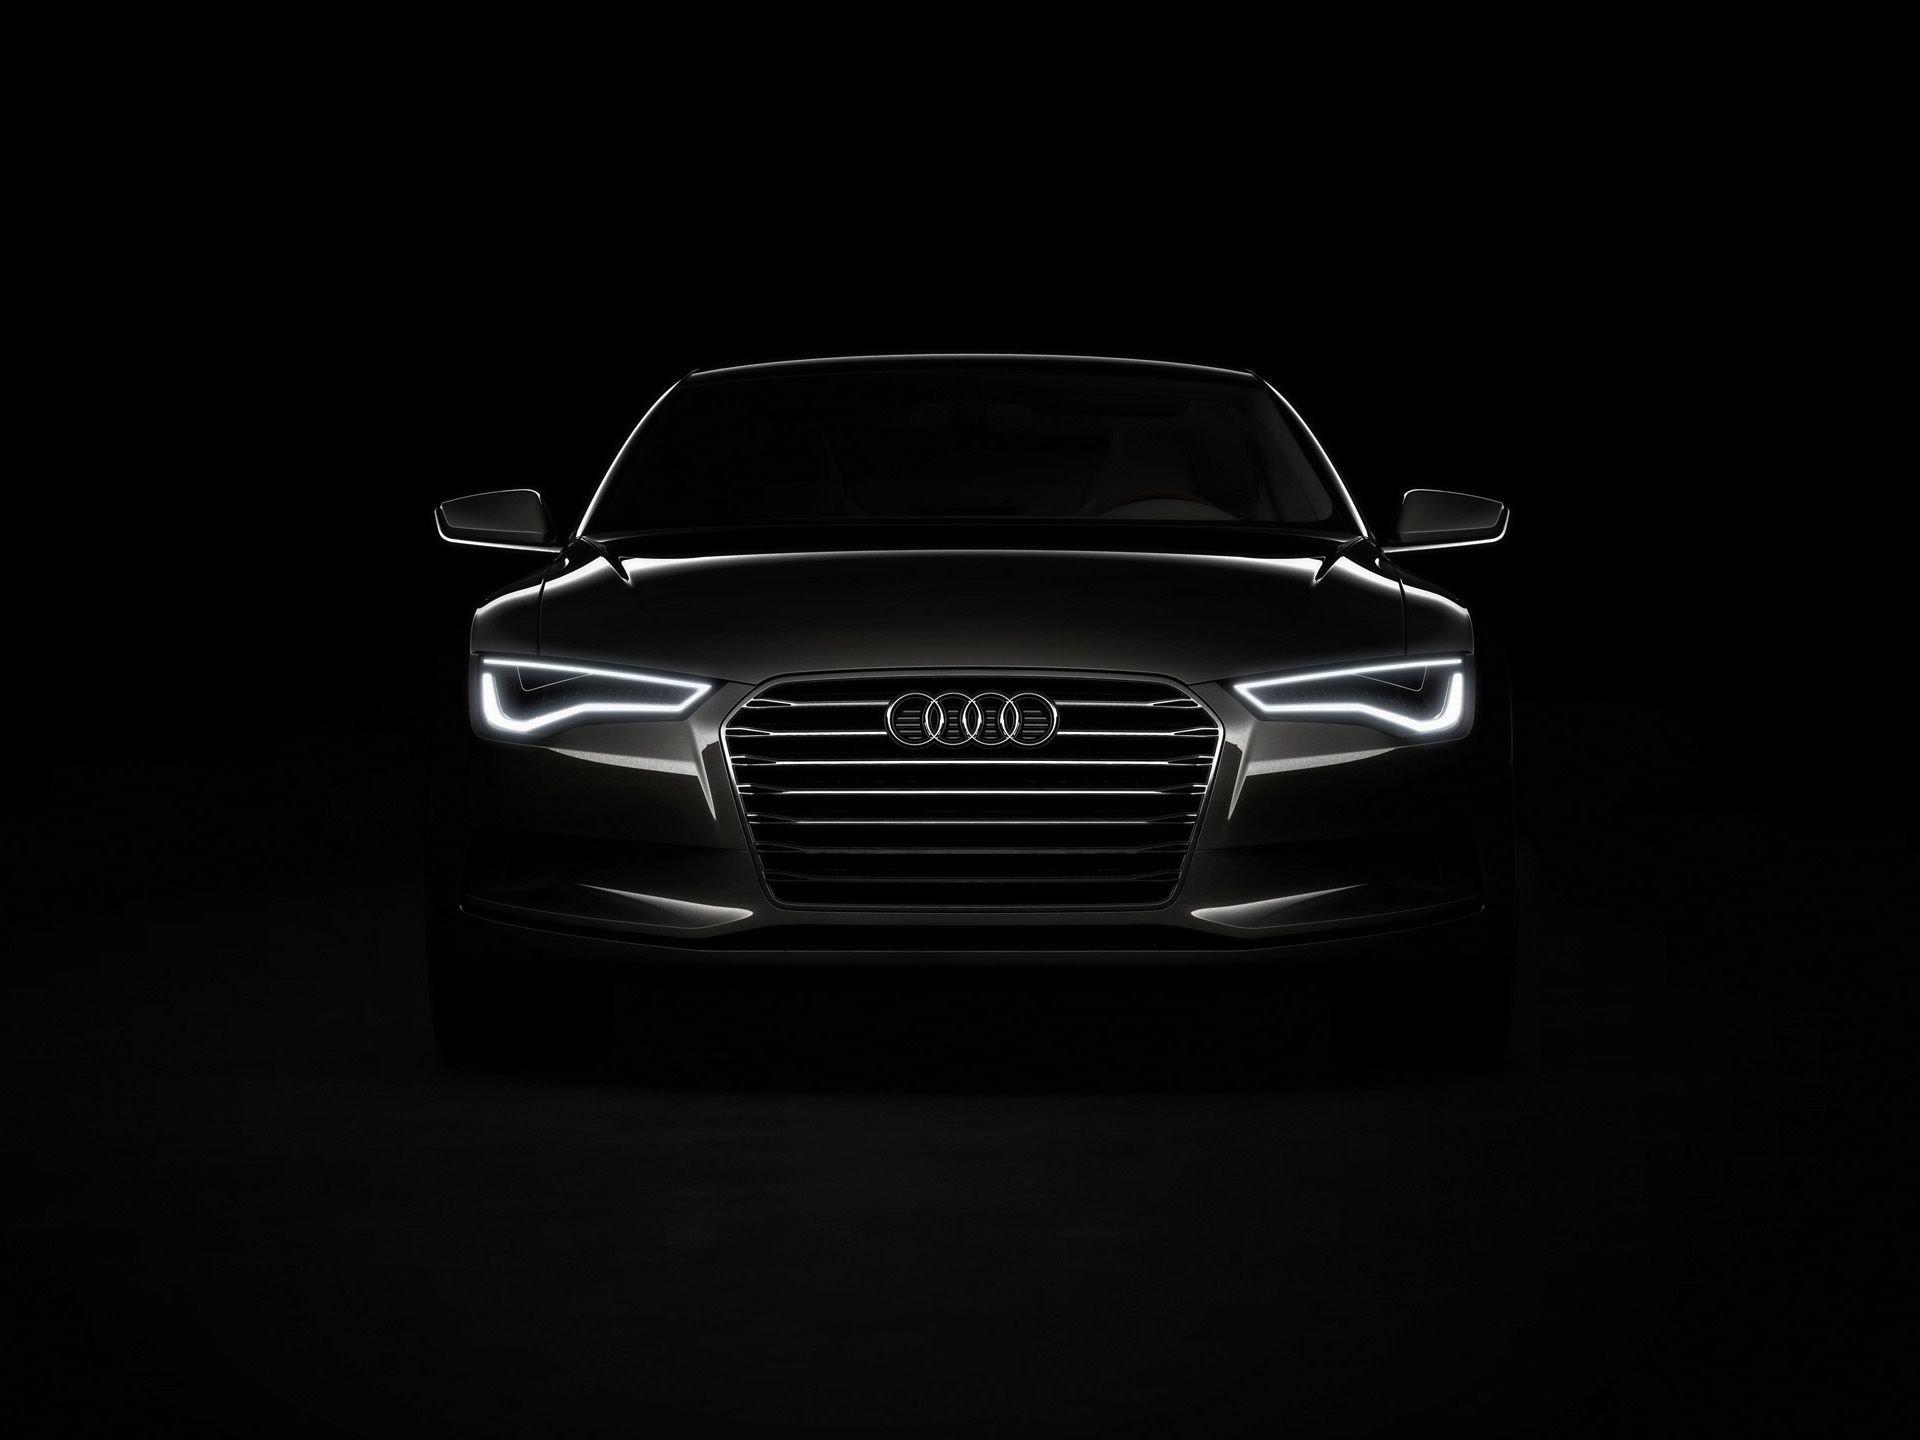 Audi R8 Front Black wallpaper | 1920x1440 | 455696 ...